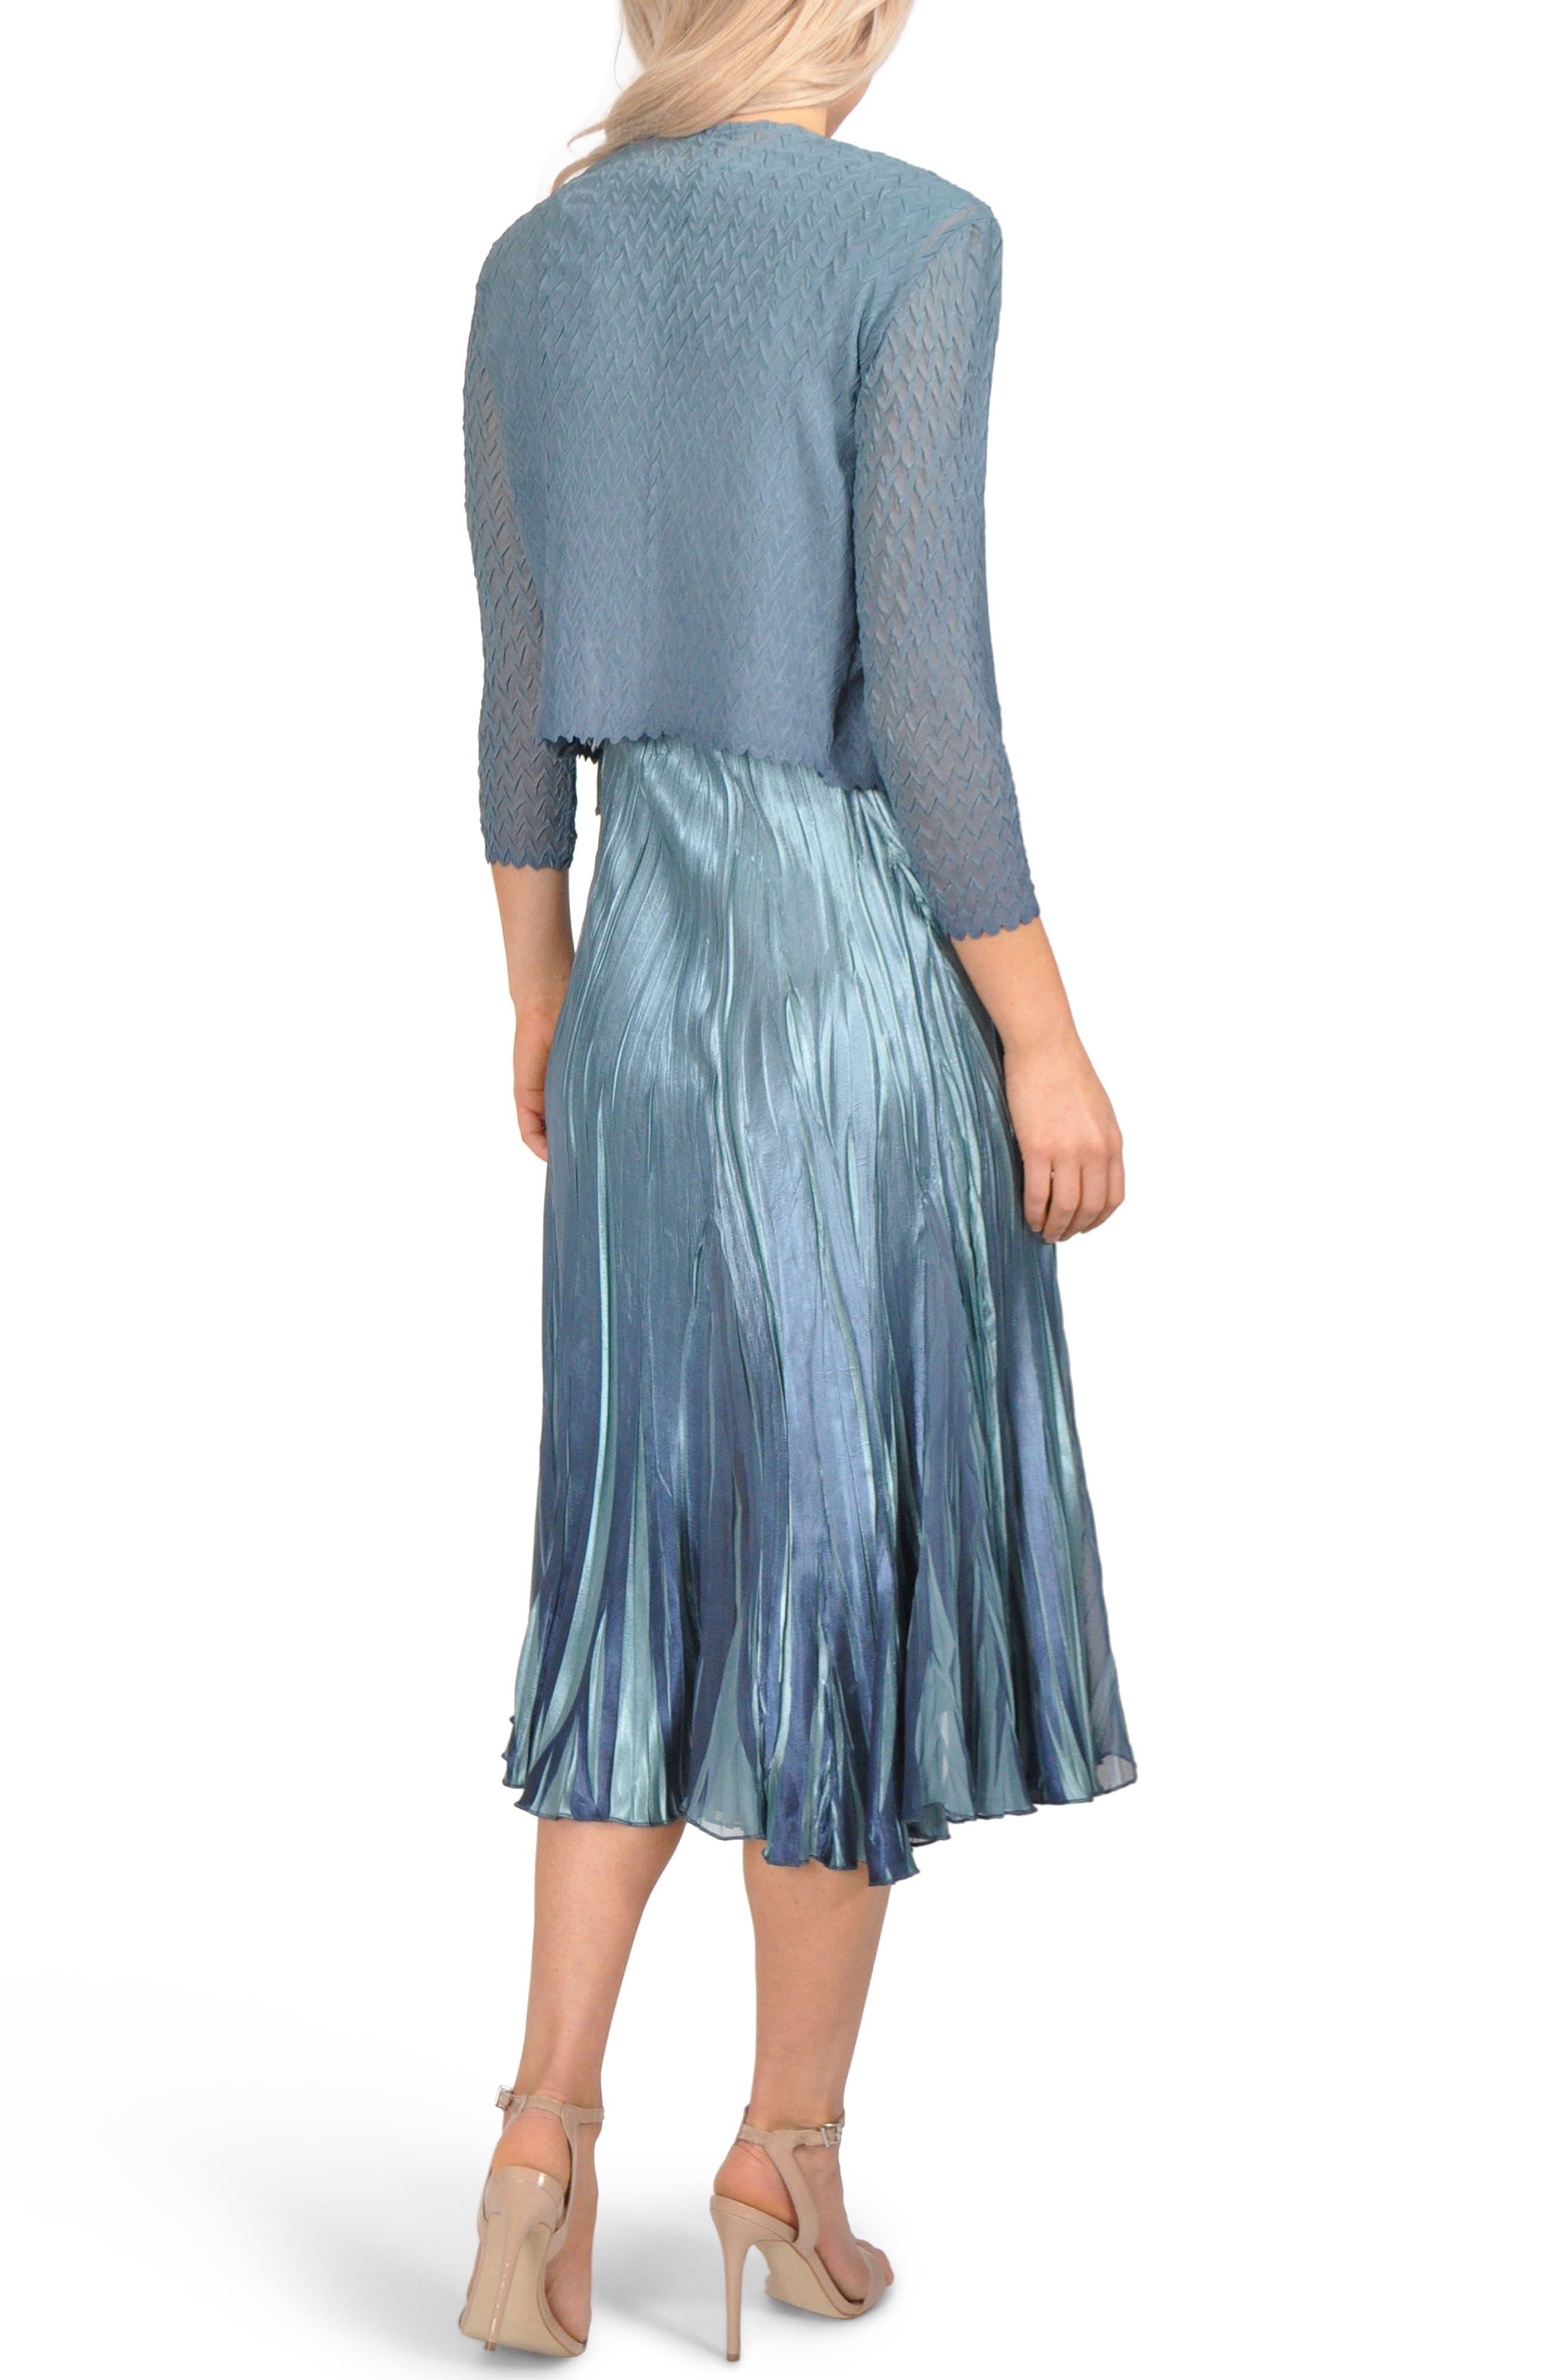 KOMAROV, Embellished Pleat Mixed Media Dress with Jacket, Alternate thumbnail 2, color, 405